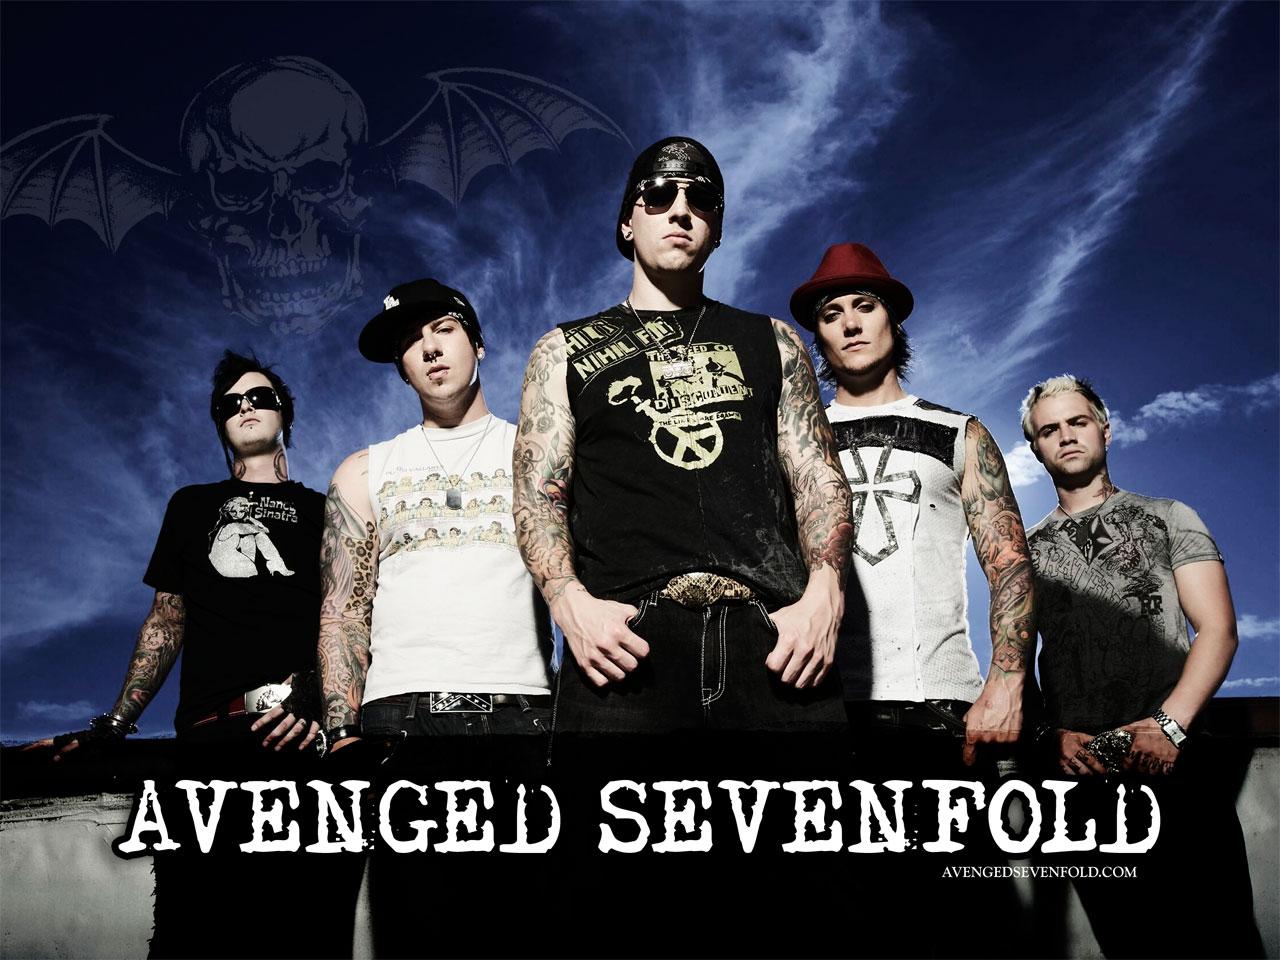 http://3.bp.blogspot.com/_-FDQJ_AewiQ/TOFJYfnyKSI/AAAAAAAAAHE/WrKVd7eHSU8/s1600/avenged_sevenfold_2.jpg